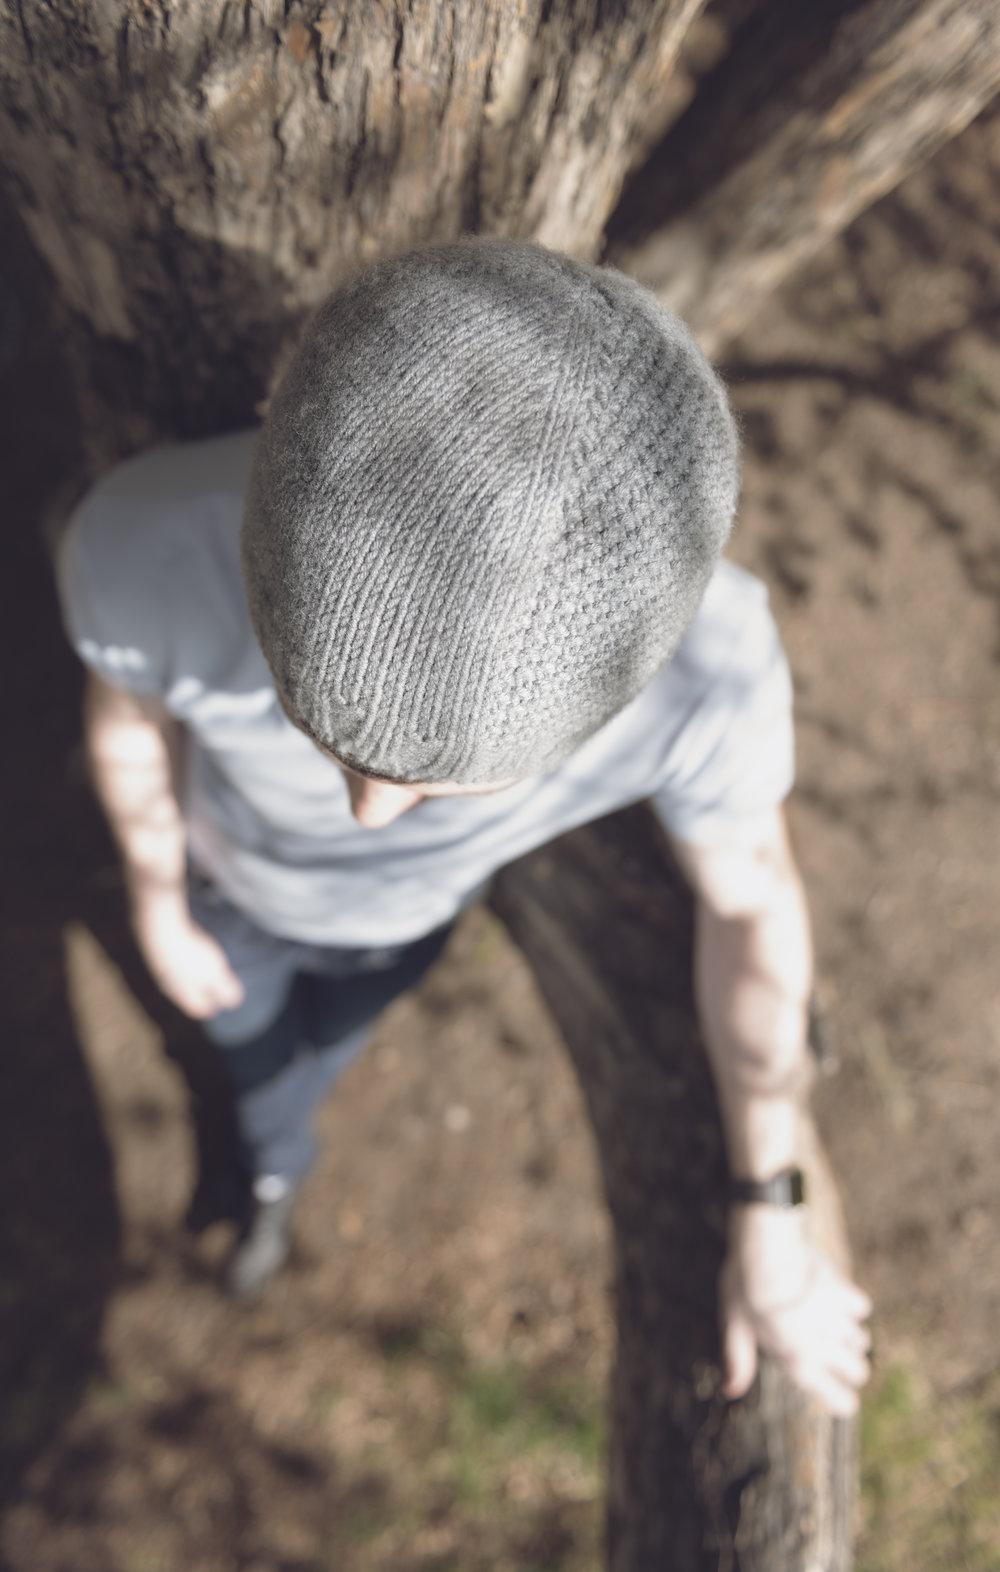 Ben_Knitting_Hat-2.jpg